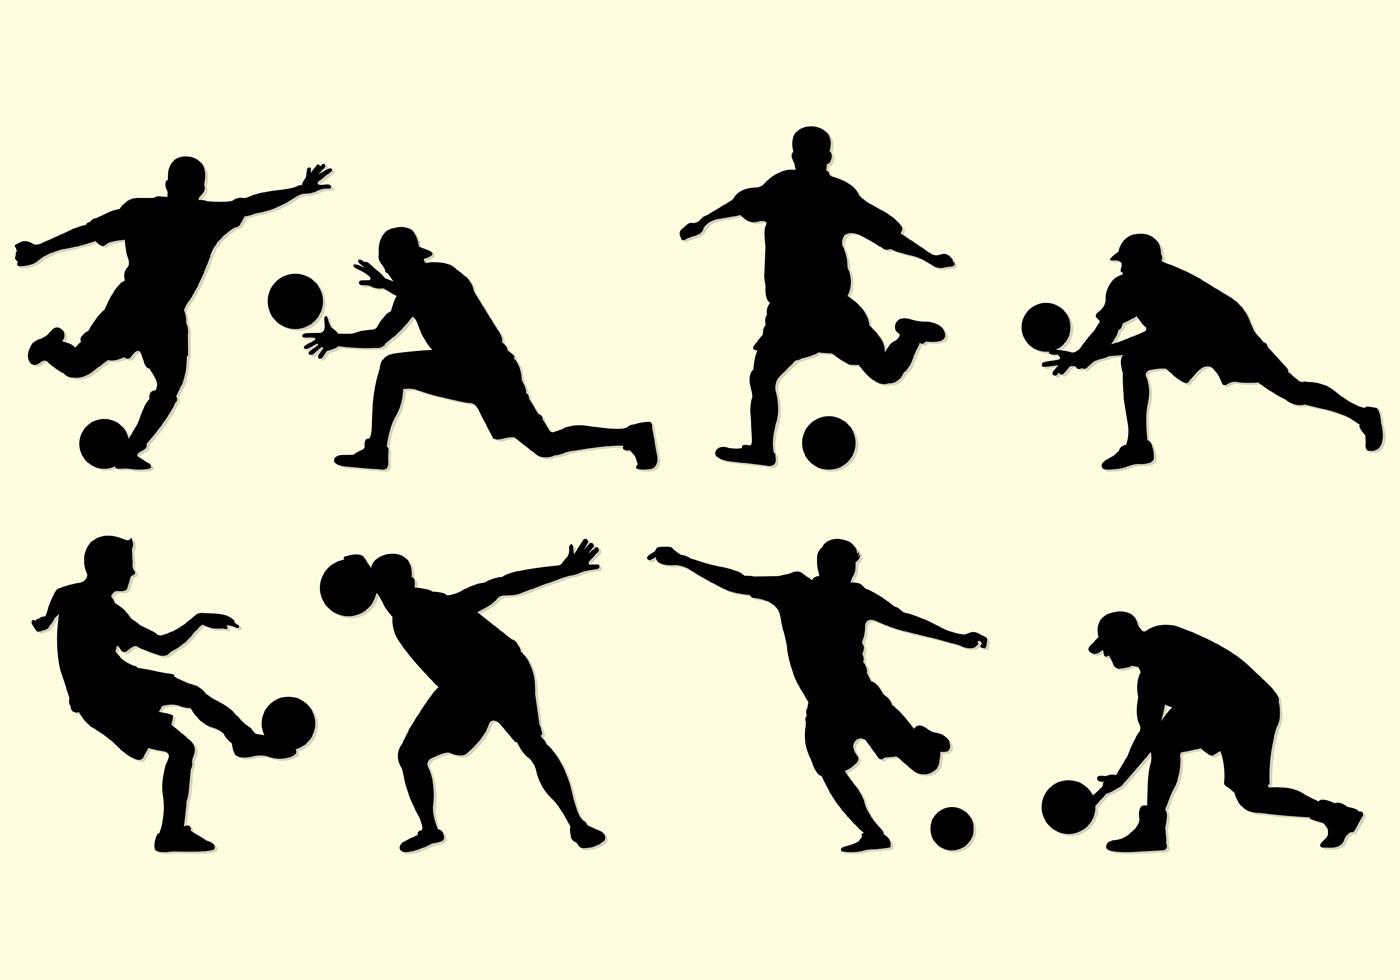 Kickball Silhouette Free Vector.